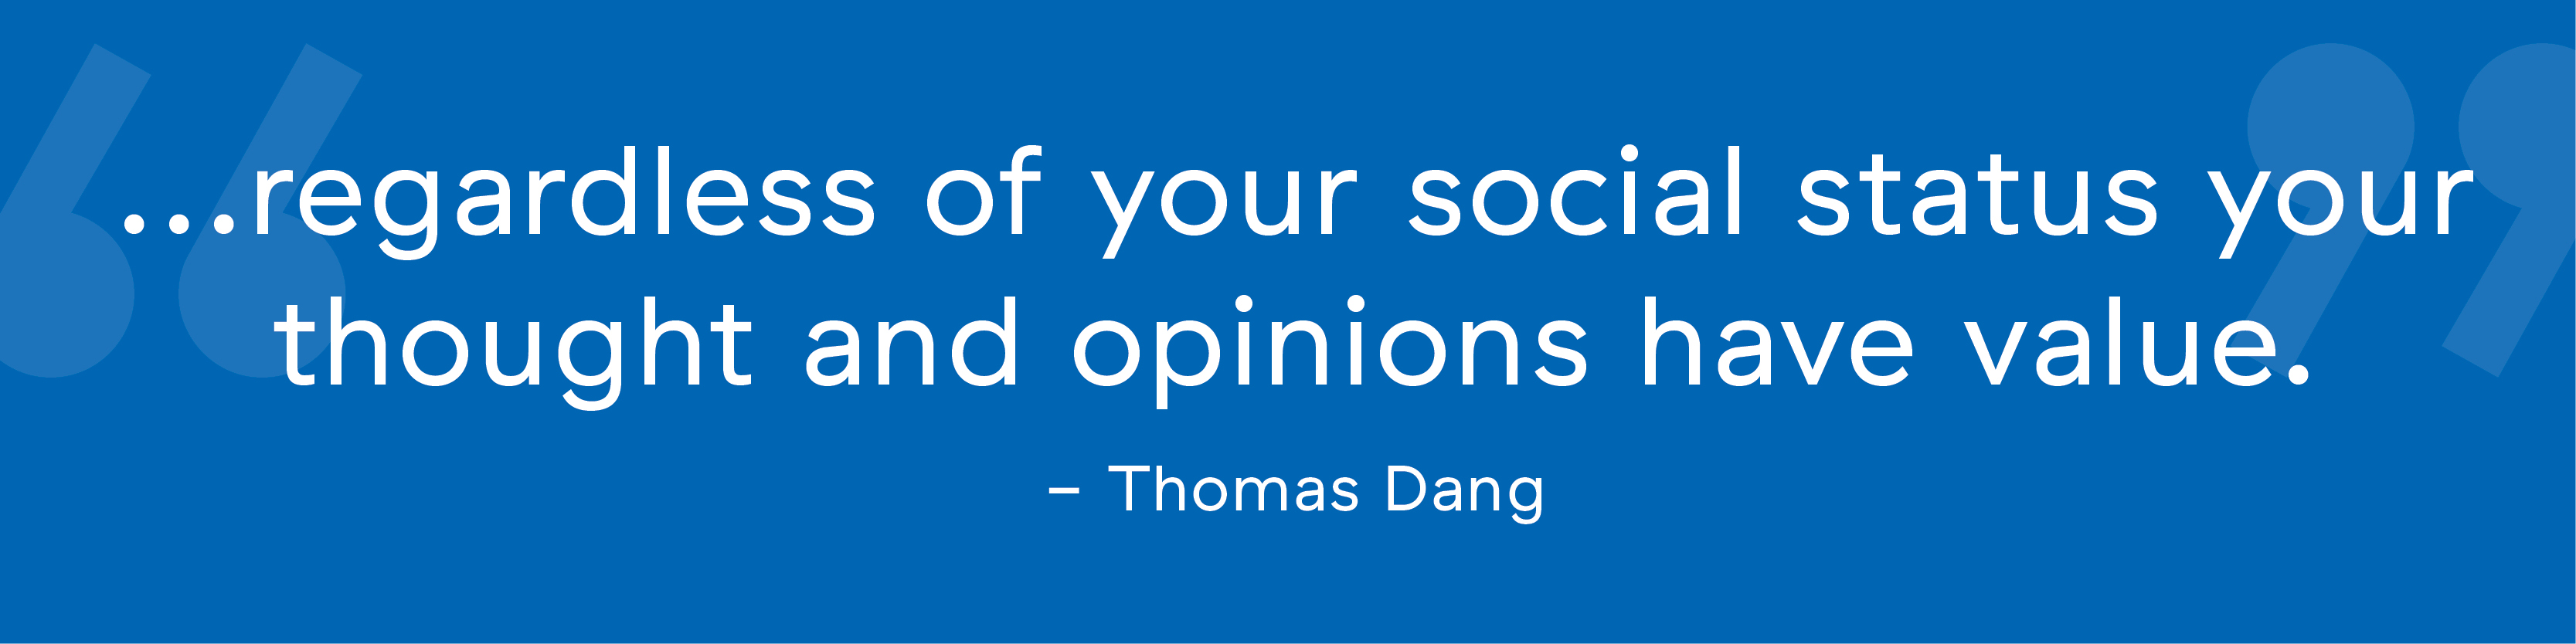 Thomas Dang